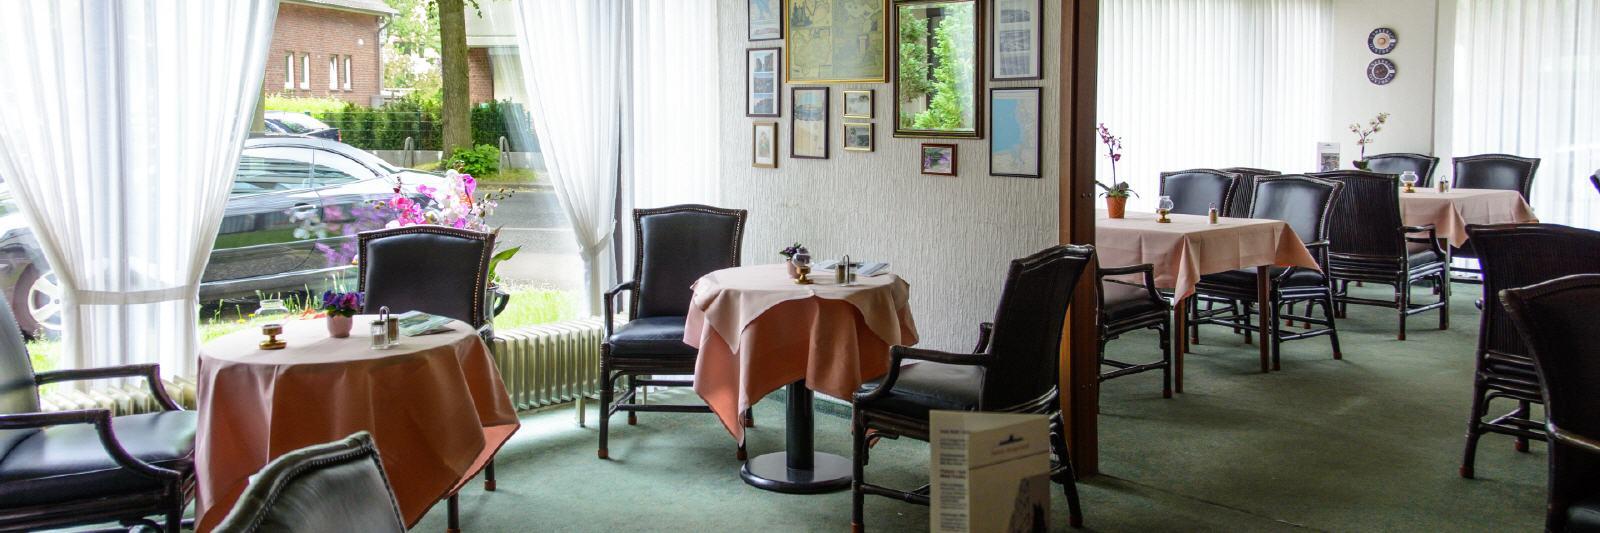 Hotel Helgoland Hamburg Anfahrt